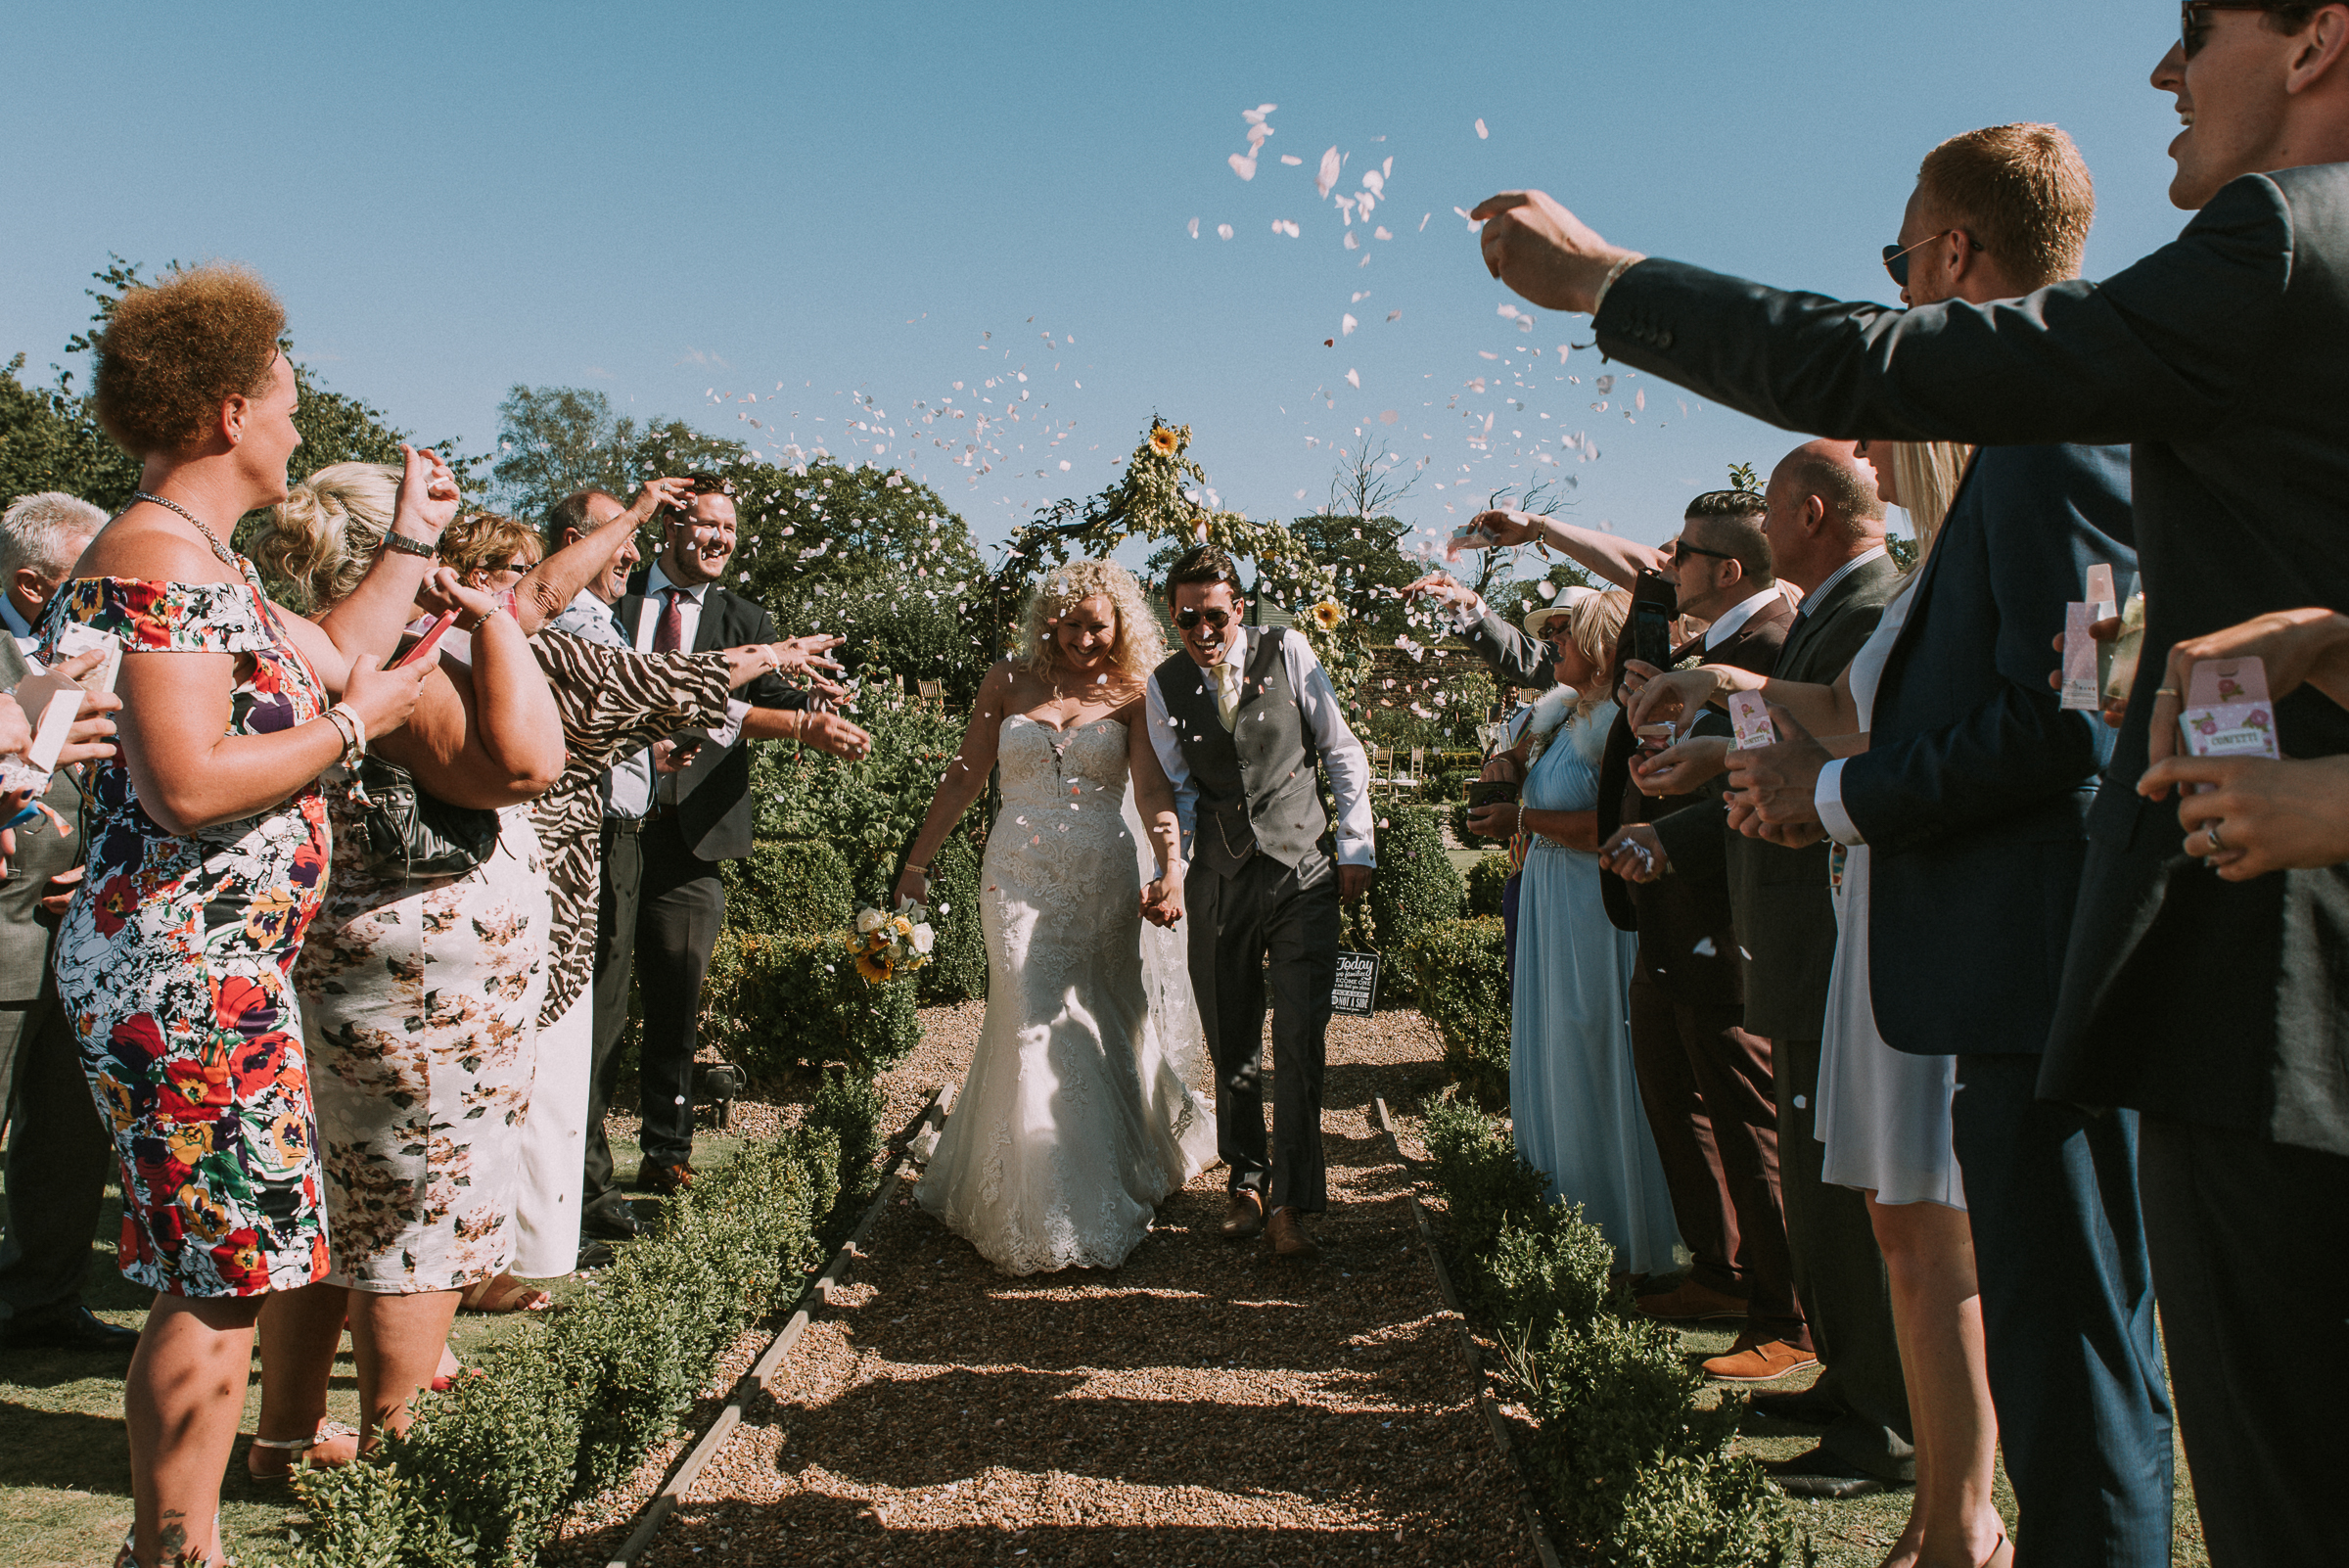 Festival Wedding Photography Secret Garden Maidstone Kent Jay Tunbridge Photorgaphic Co-35.jpg